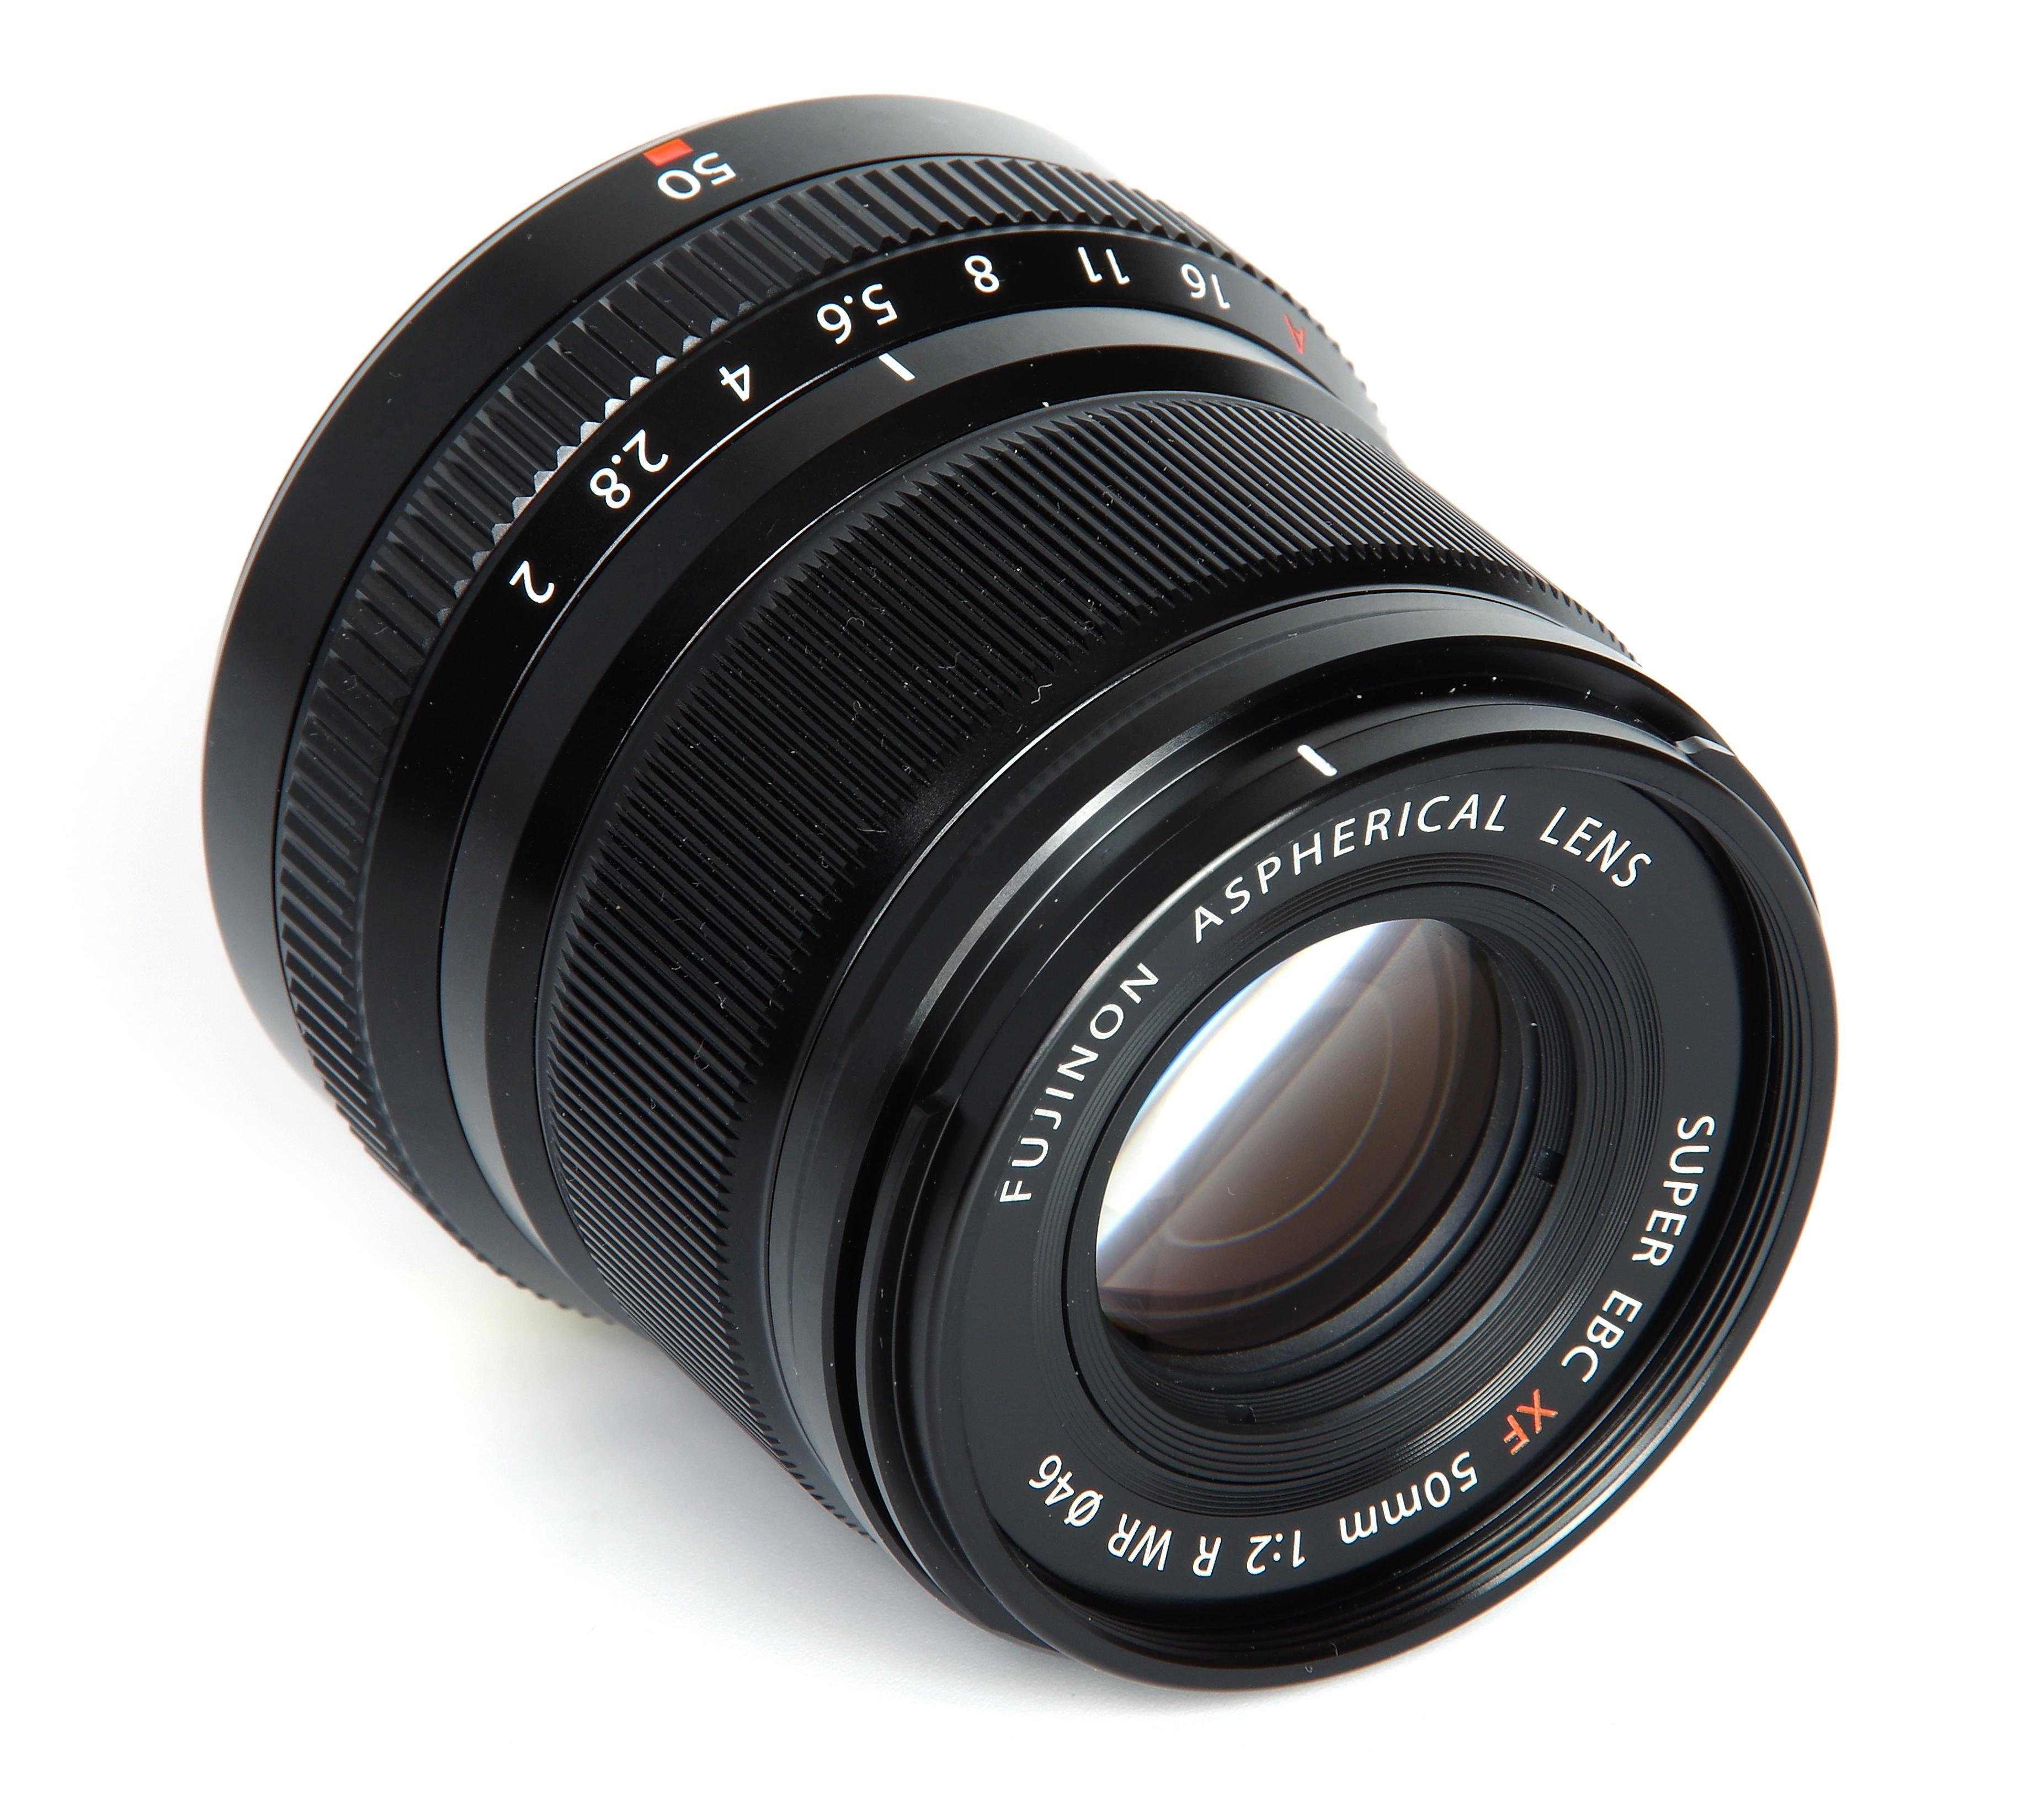 Fujifilm Fujinon XF 50mm f/2 R WR Review | ePHOTOzine